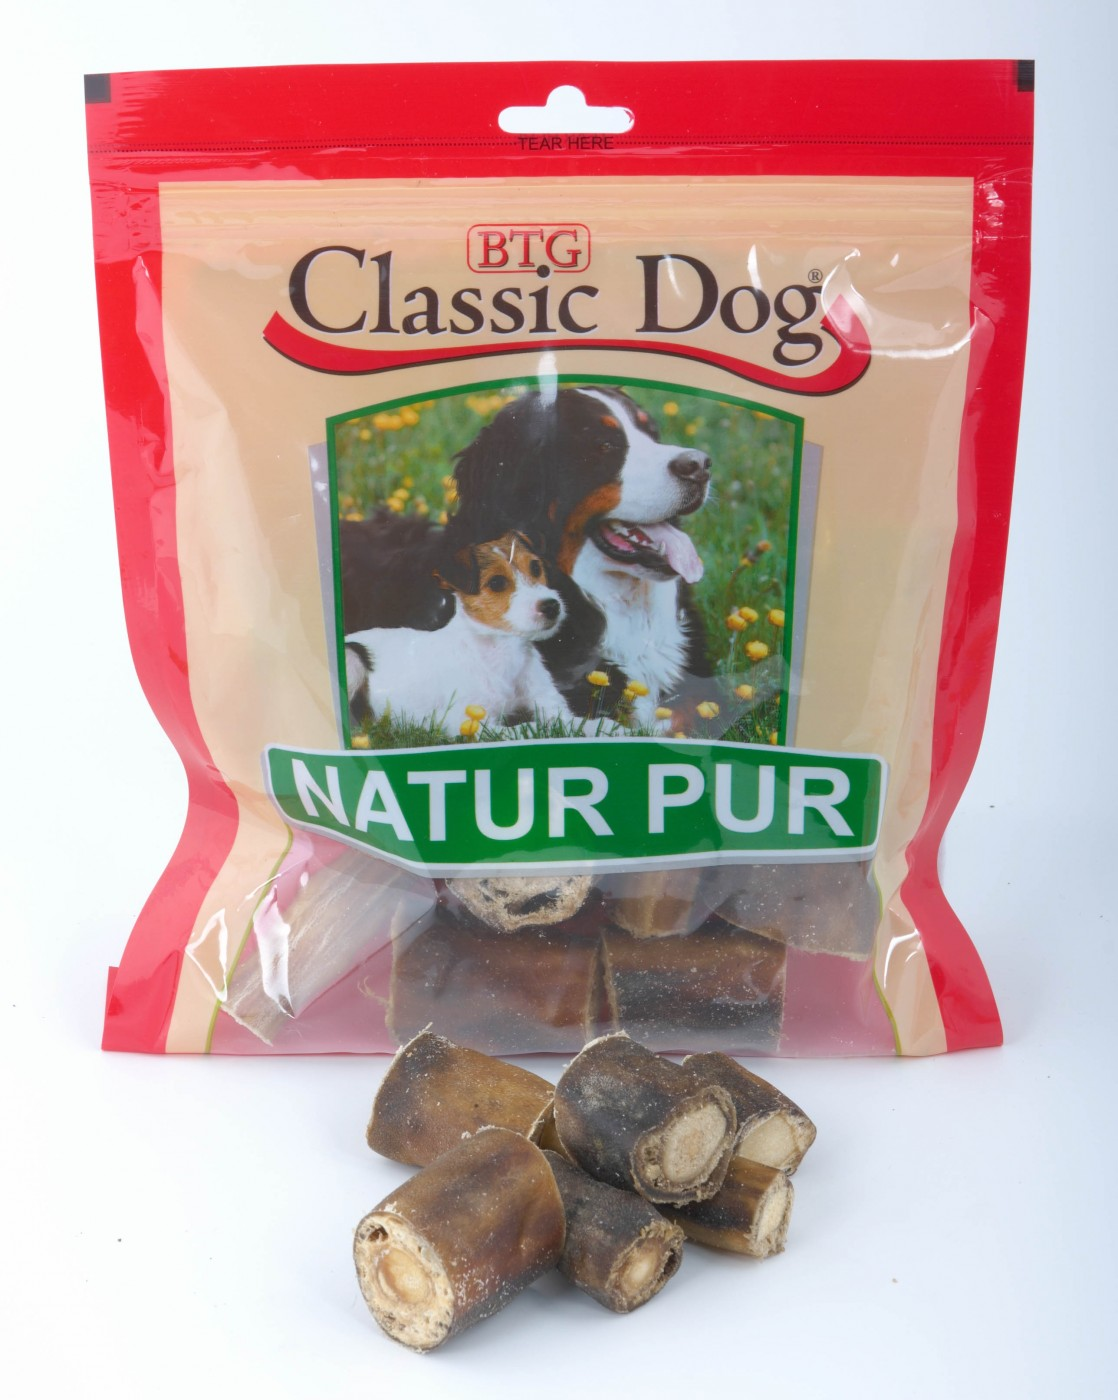 Classic Dog Ochsenschwanzspitzen | 200g Hundesnack